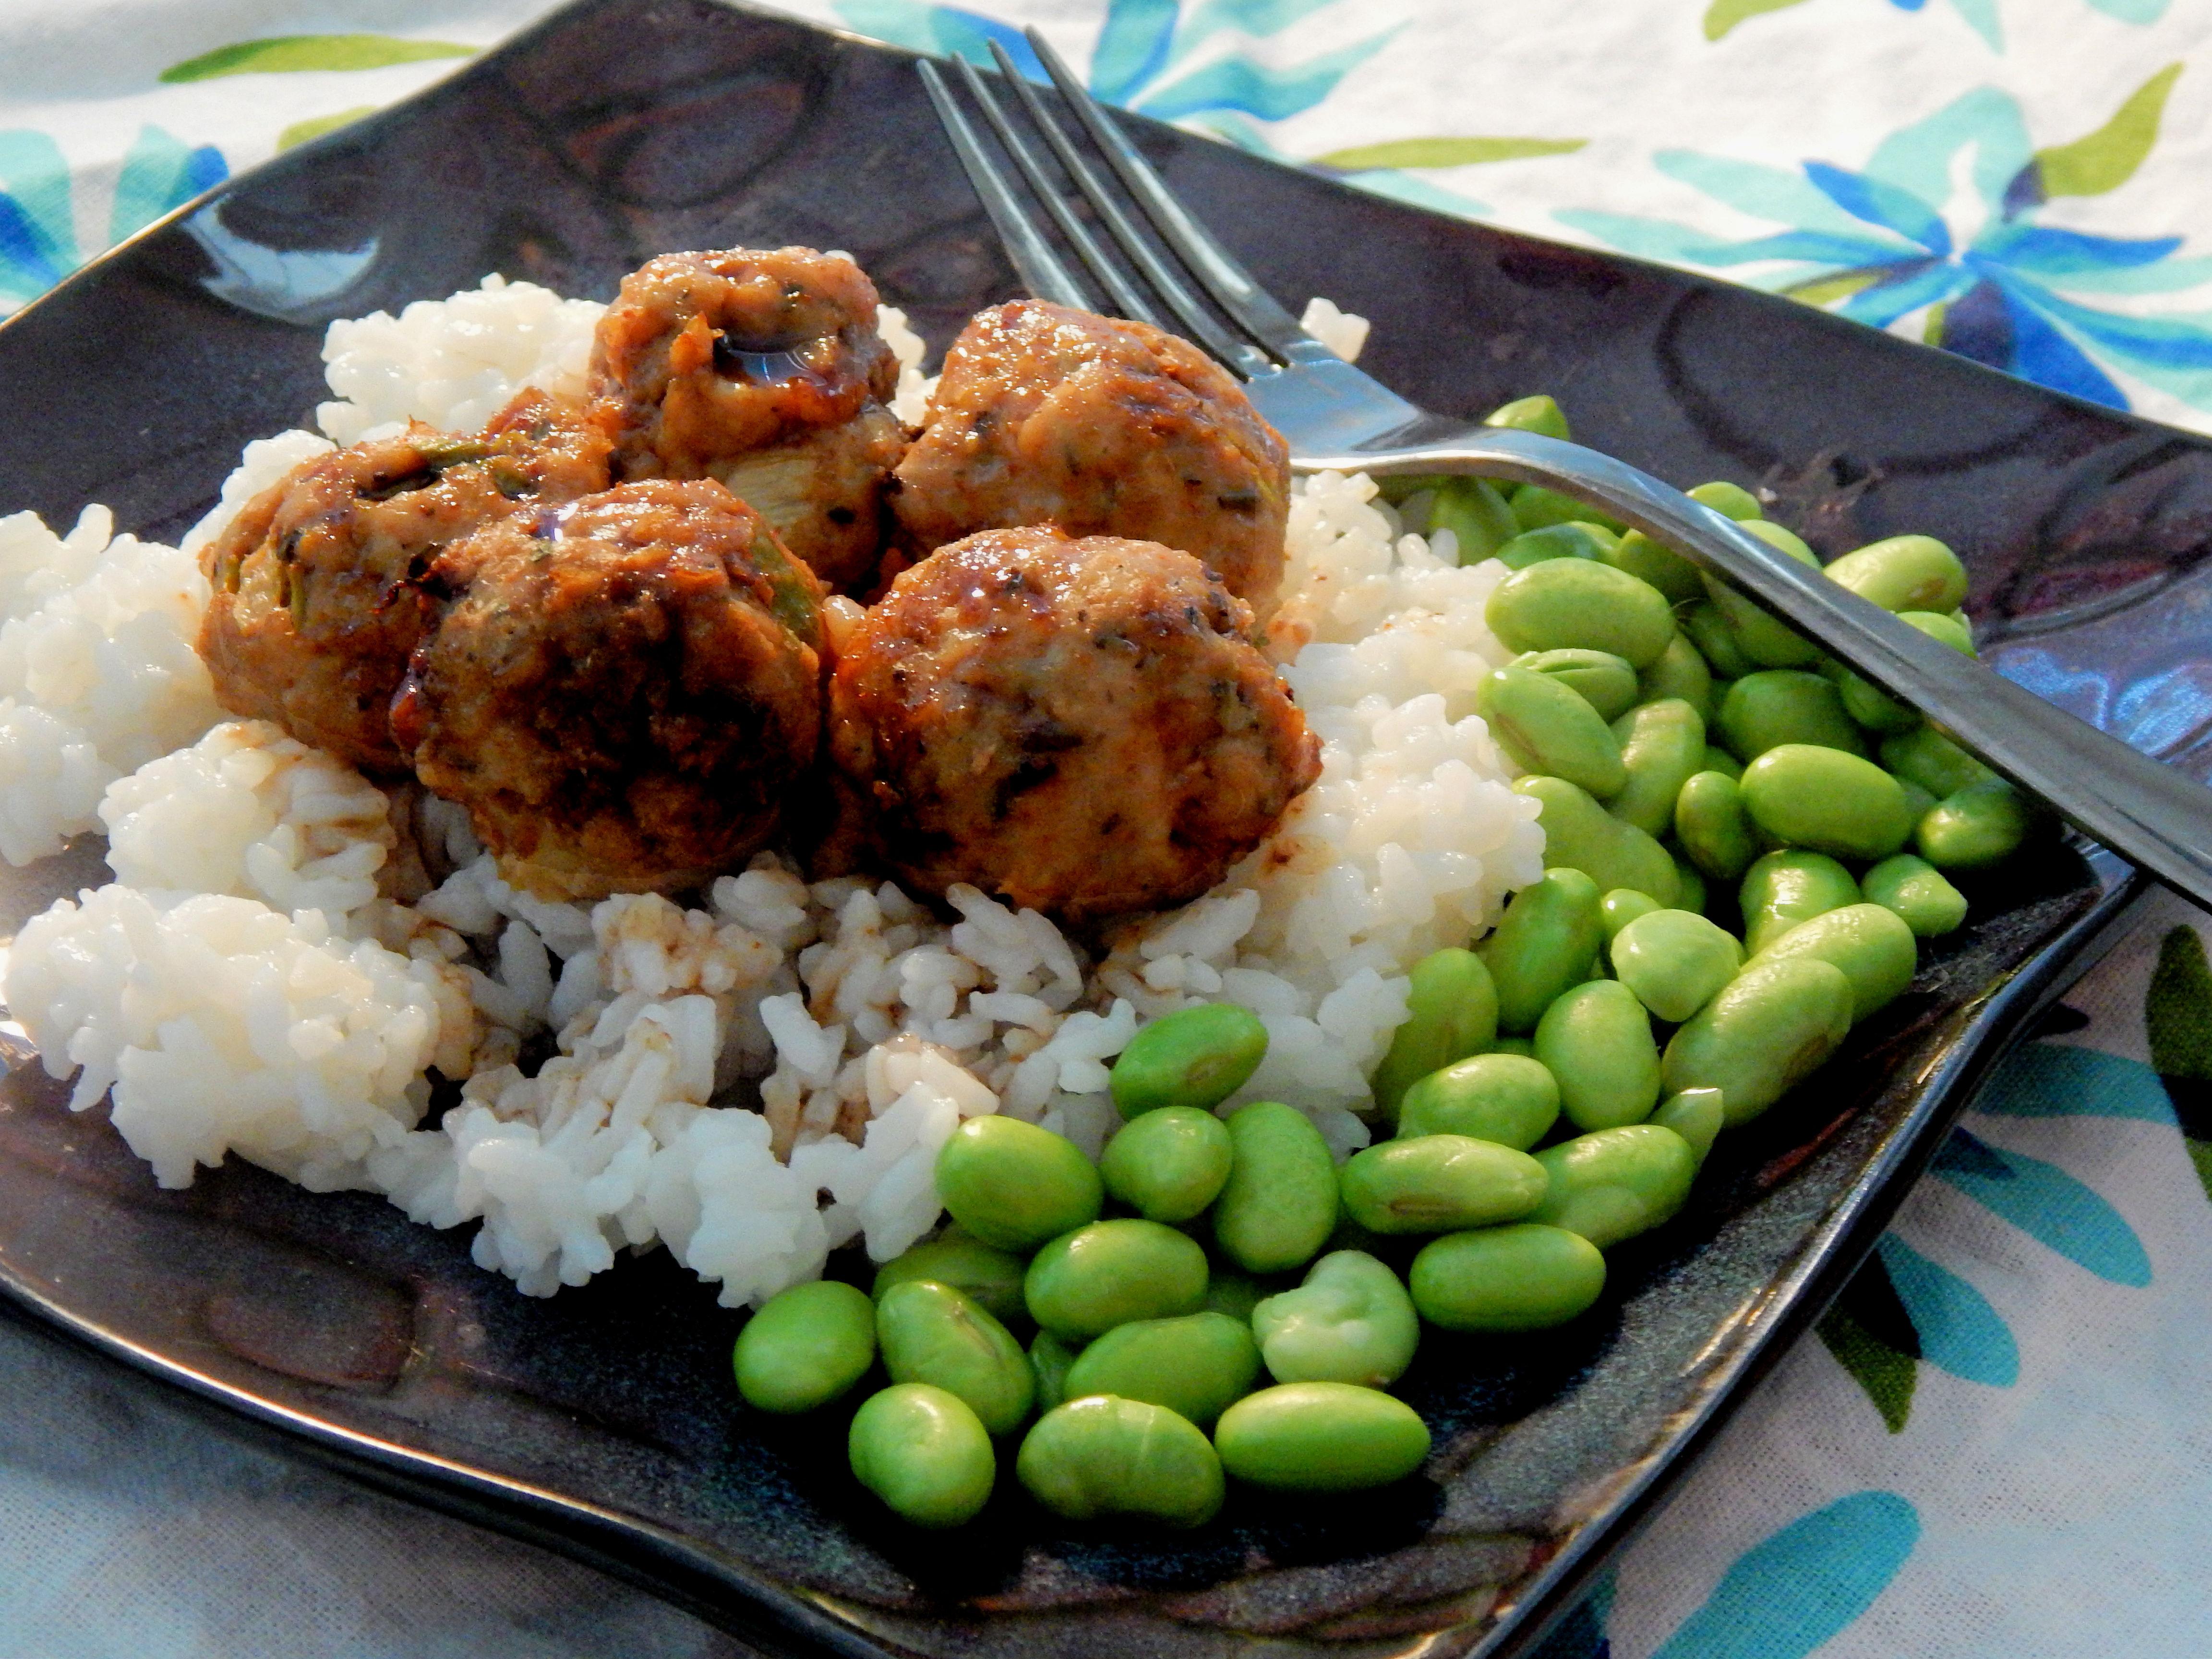 Asian Turkey Meatballs with Chile-Garlic Glaze